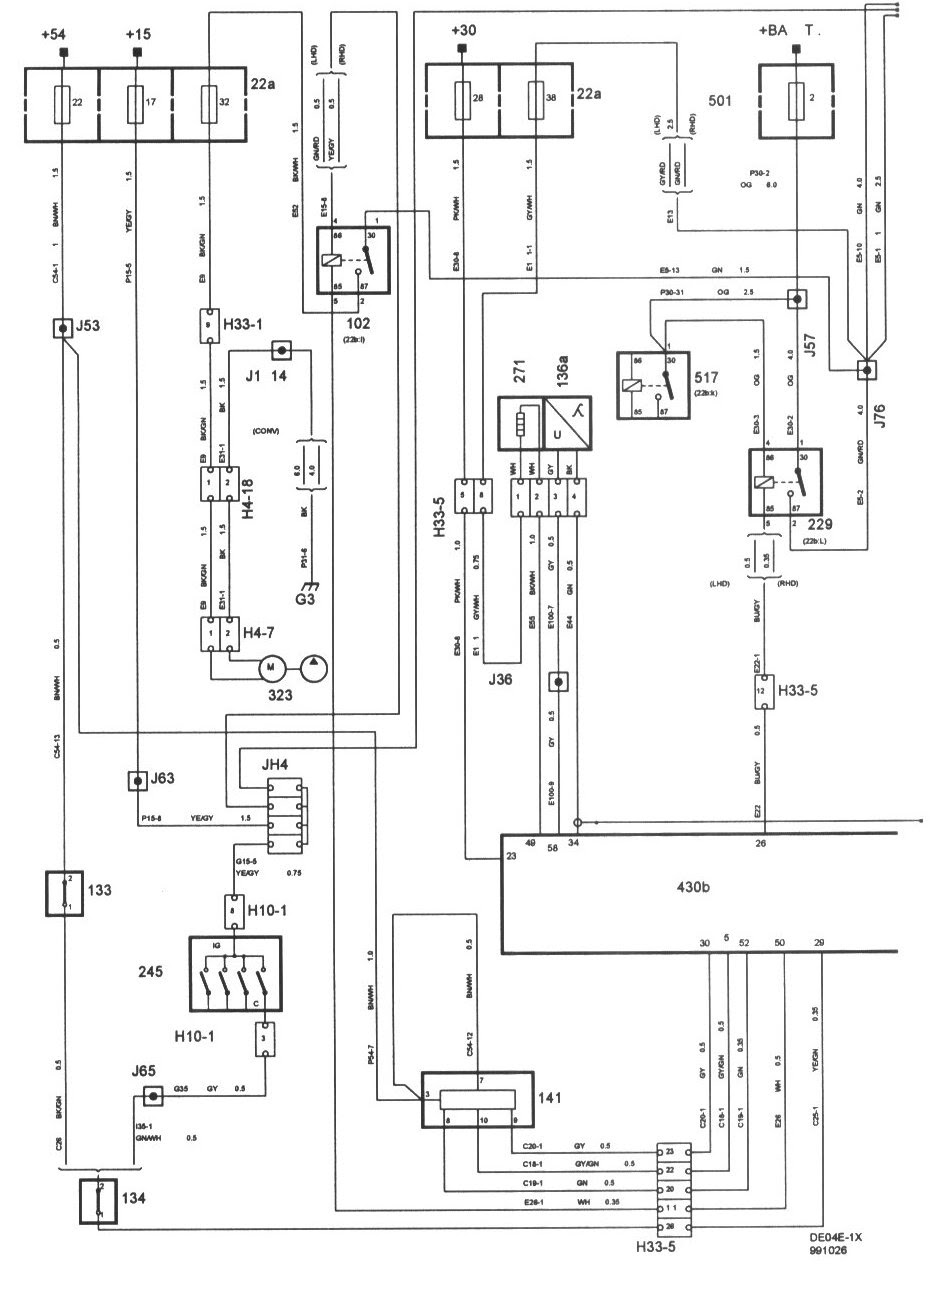 Diagram Saab 9 3 Xwd Wiring Diagram Full Version Hd Quality Wiring Diagram Diagramcovinh Gisbertovalori It